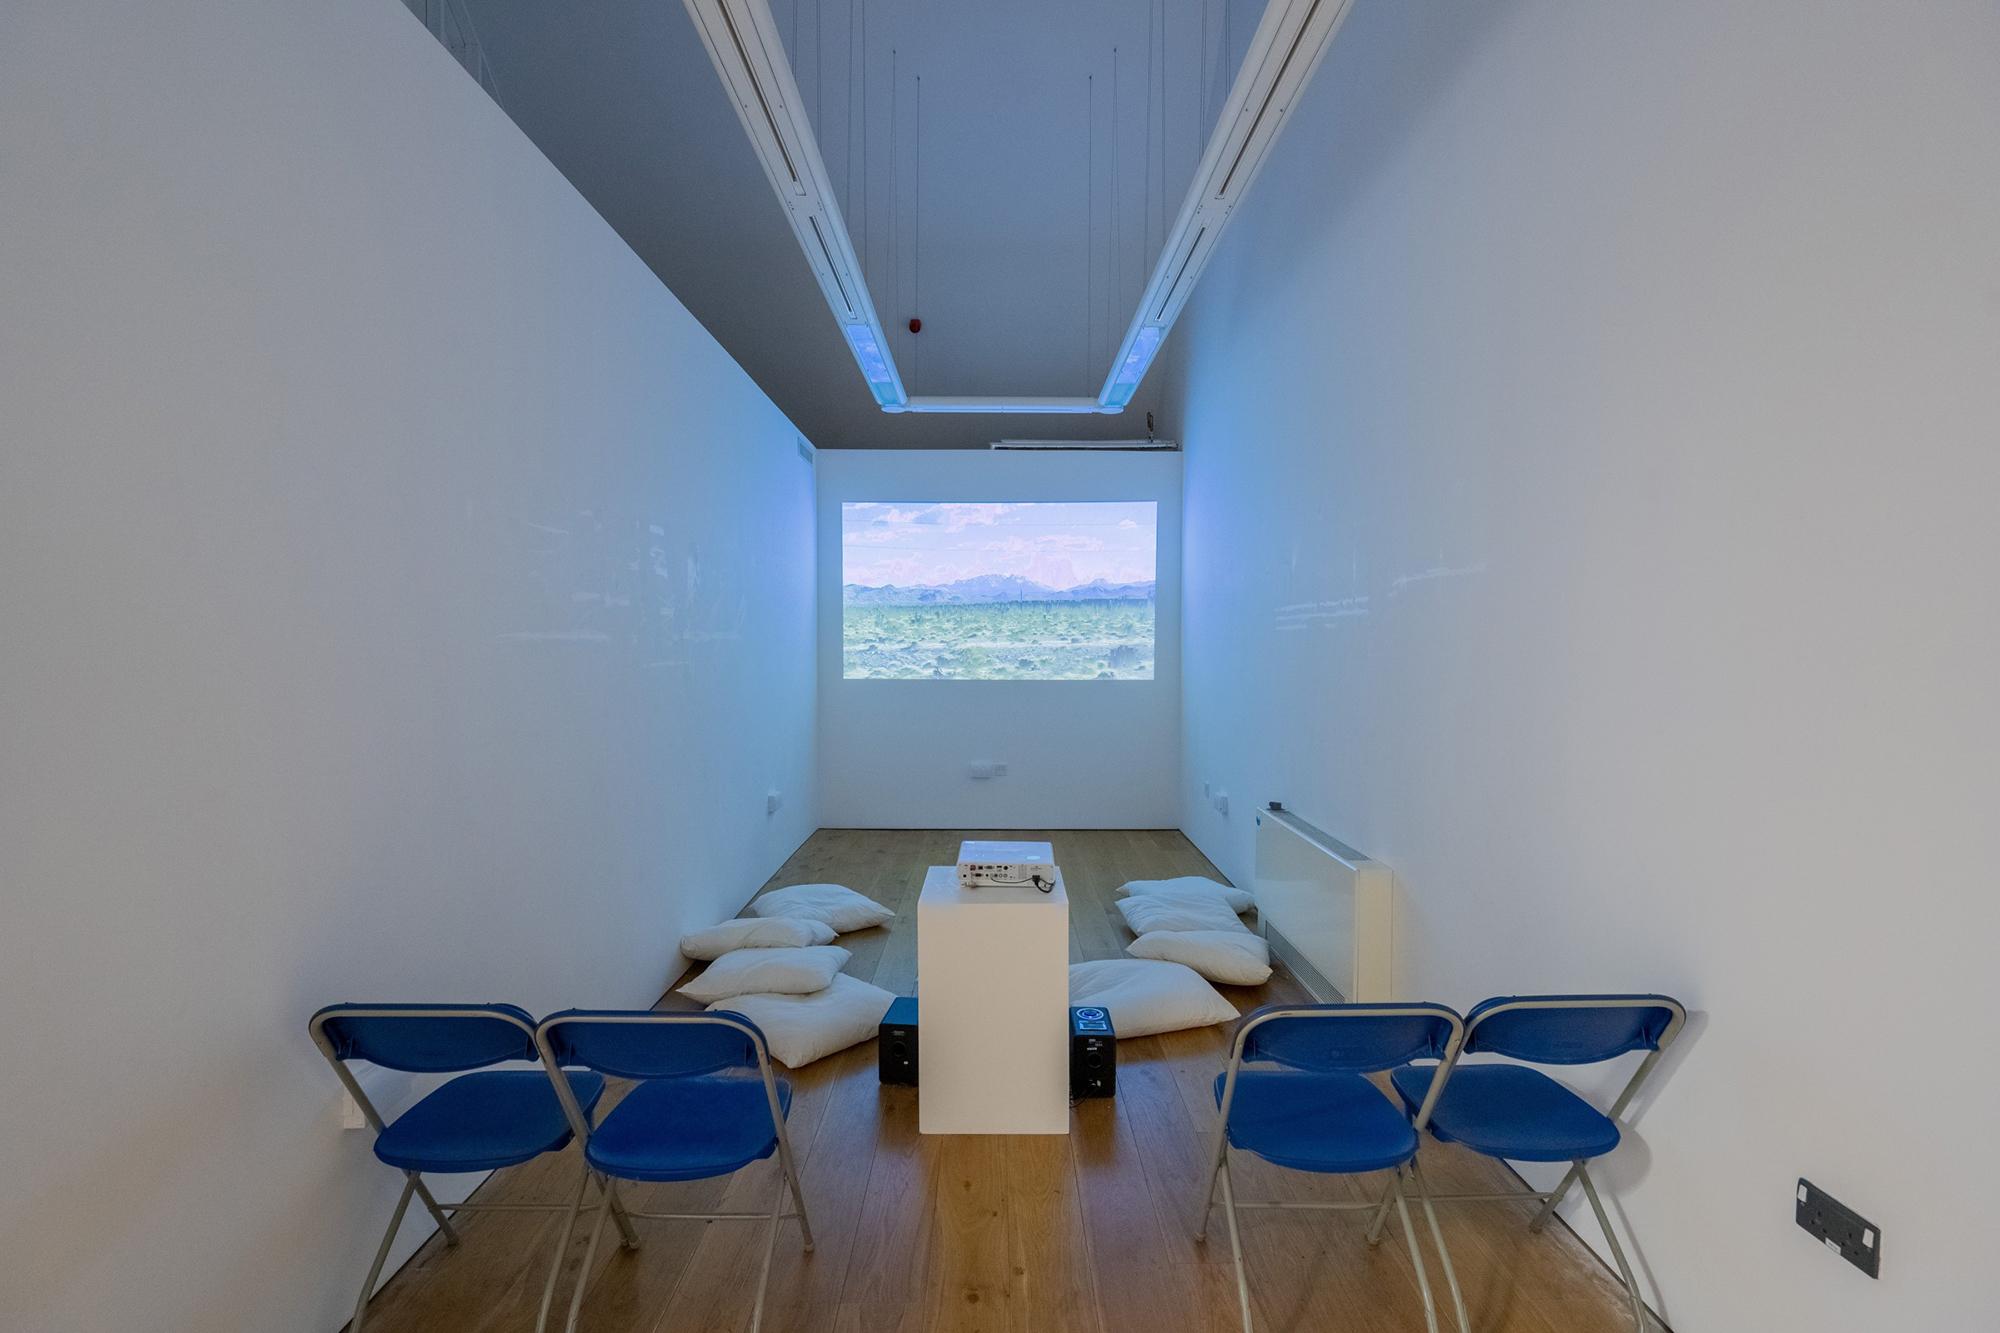 Foto fra Environmental Crisis udstillingen på Gerald Moore Gallery